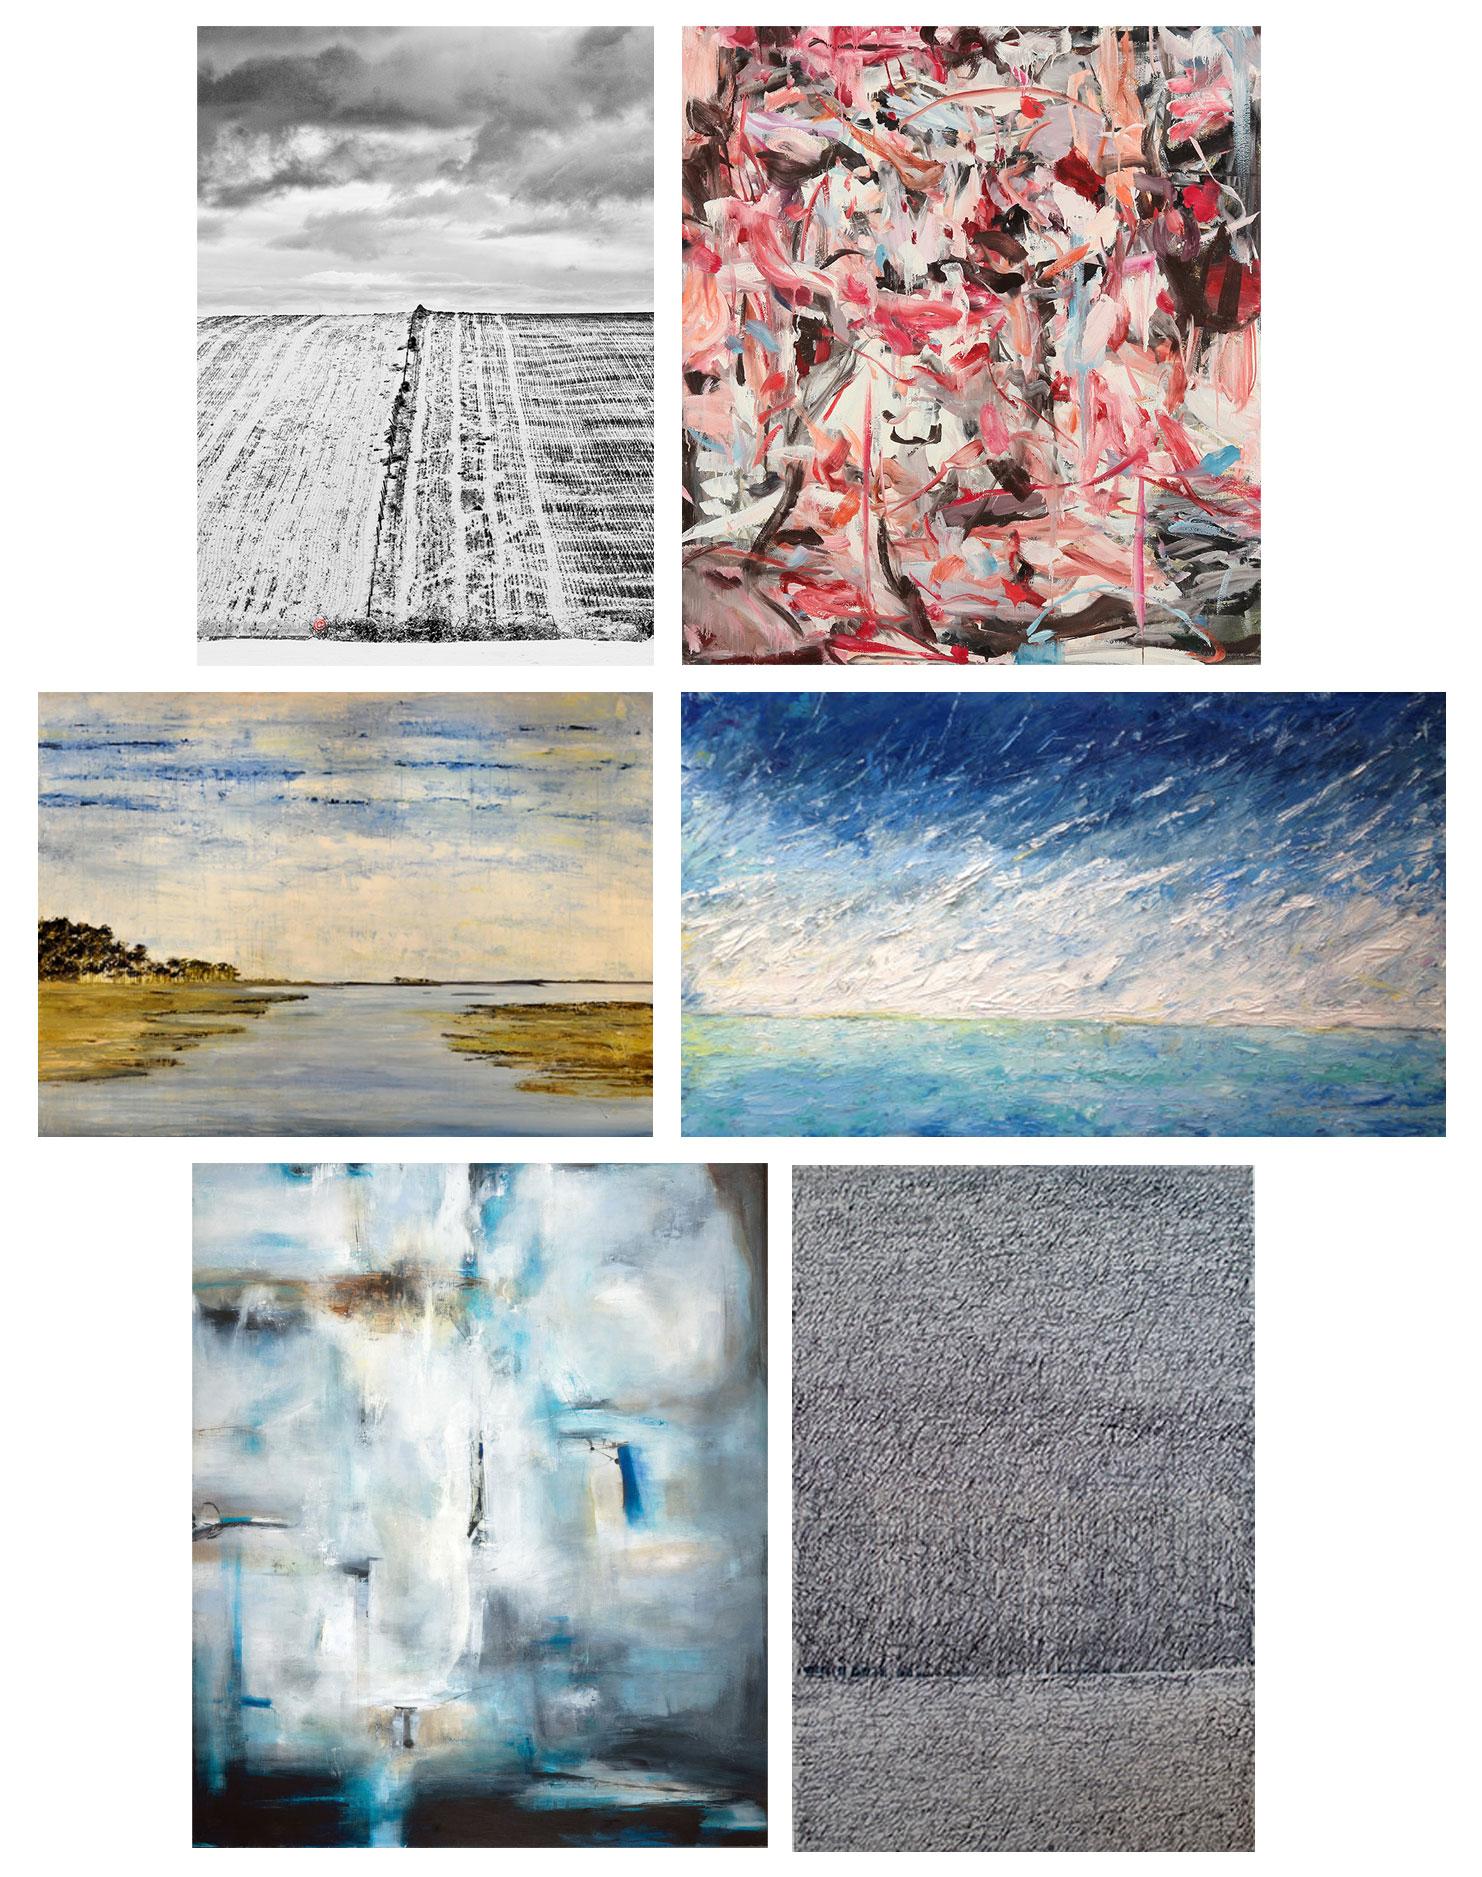 Artists: Brian McCloud, Sherrie Franssen (Dolby Chadwick Gallery), Manok Cohan (Barndiva), Alison Haley Paul (Aerena Galleries), Sargam Griffin and Anastasia Faiella (Aerena Galleries)